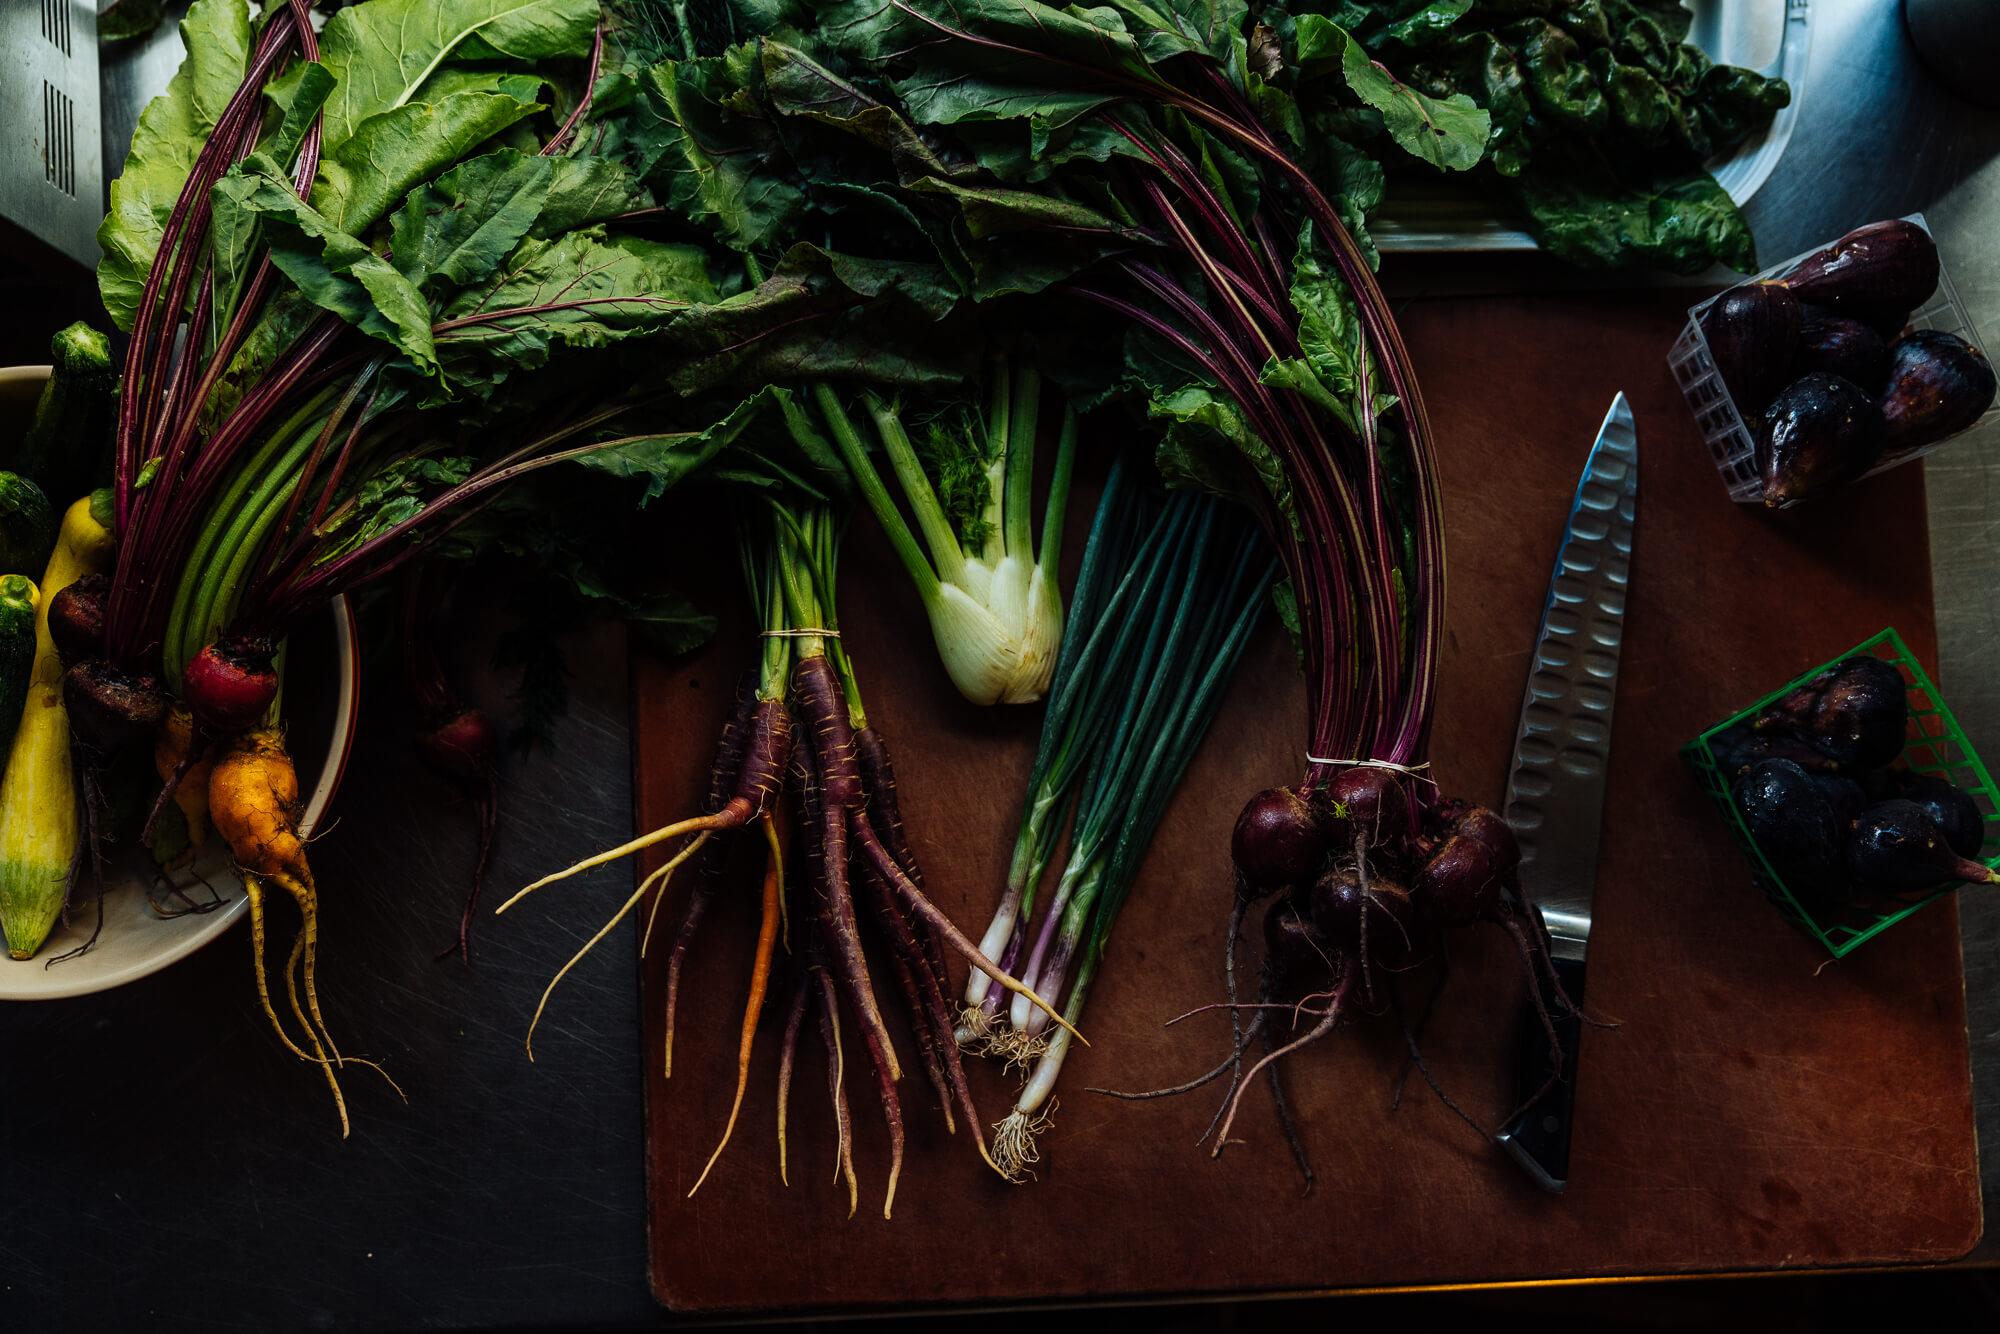 farm to table fresh ingredients